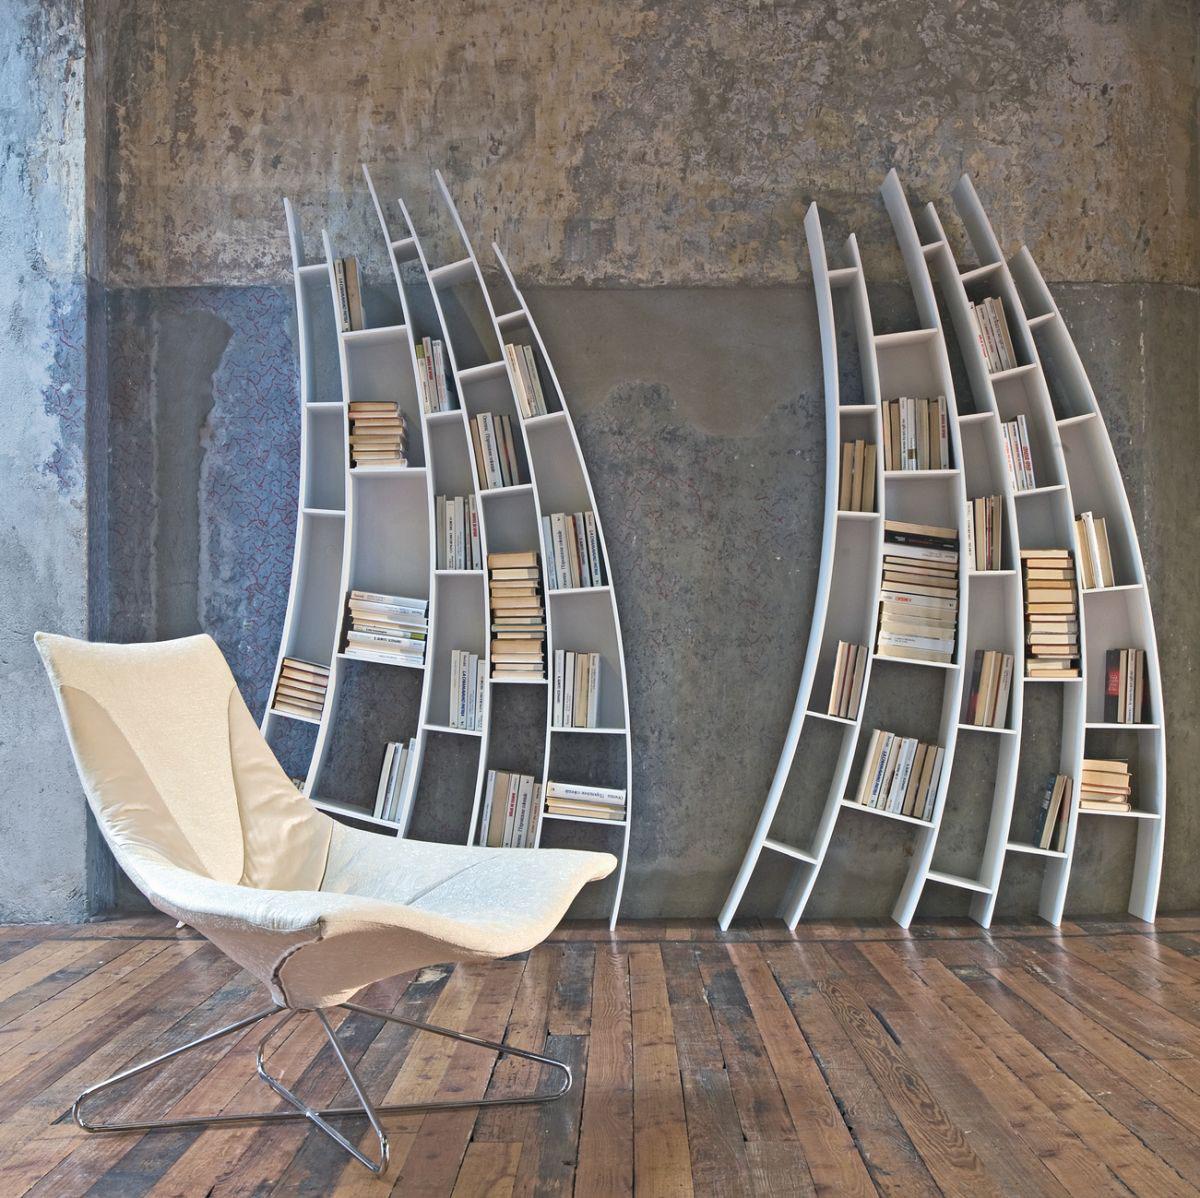 Expressive Bookshelves Surreal By Saba Italia